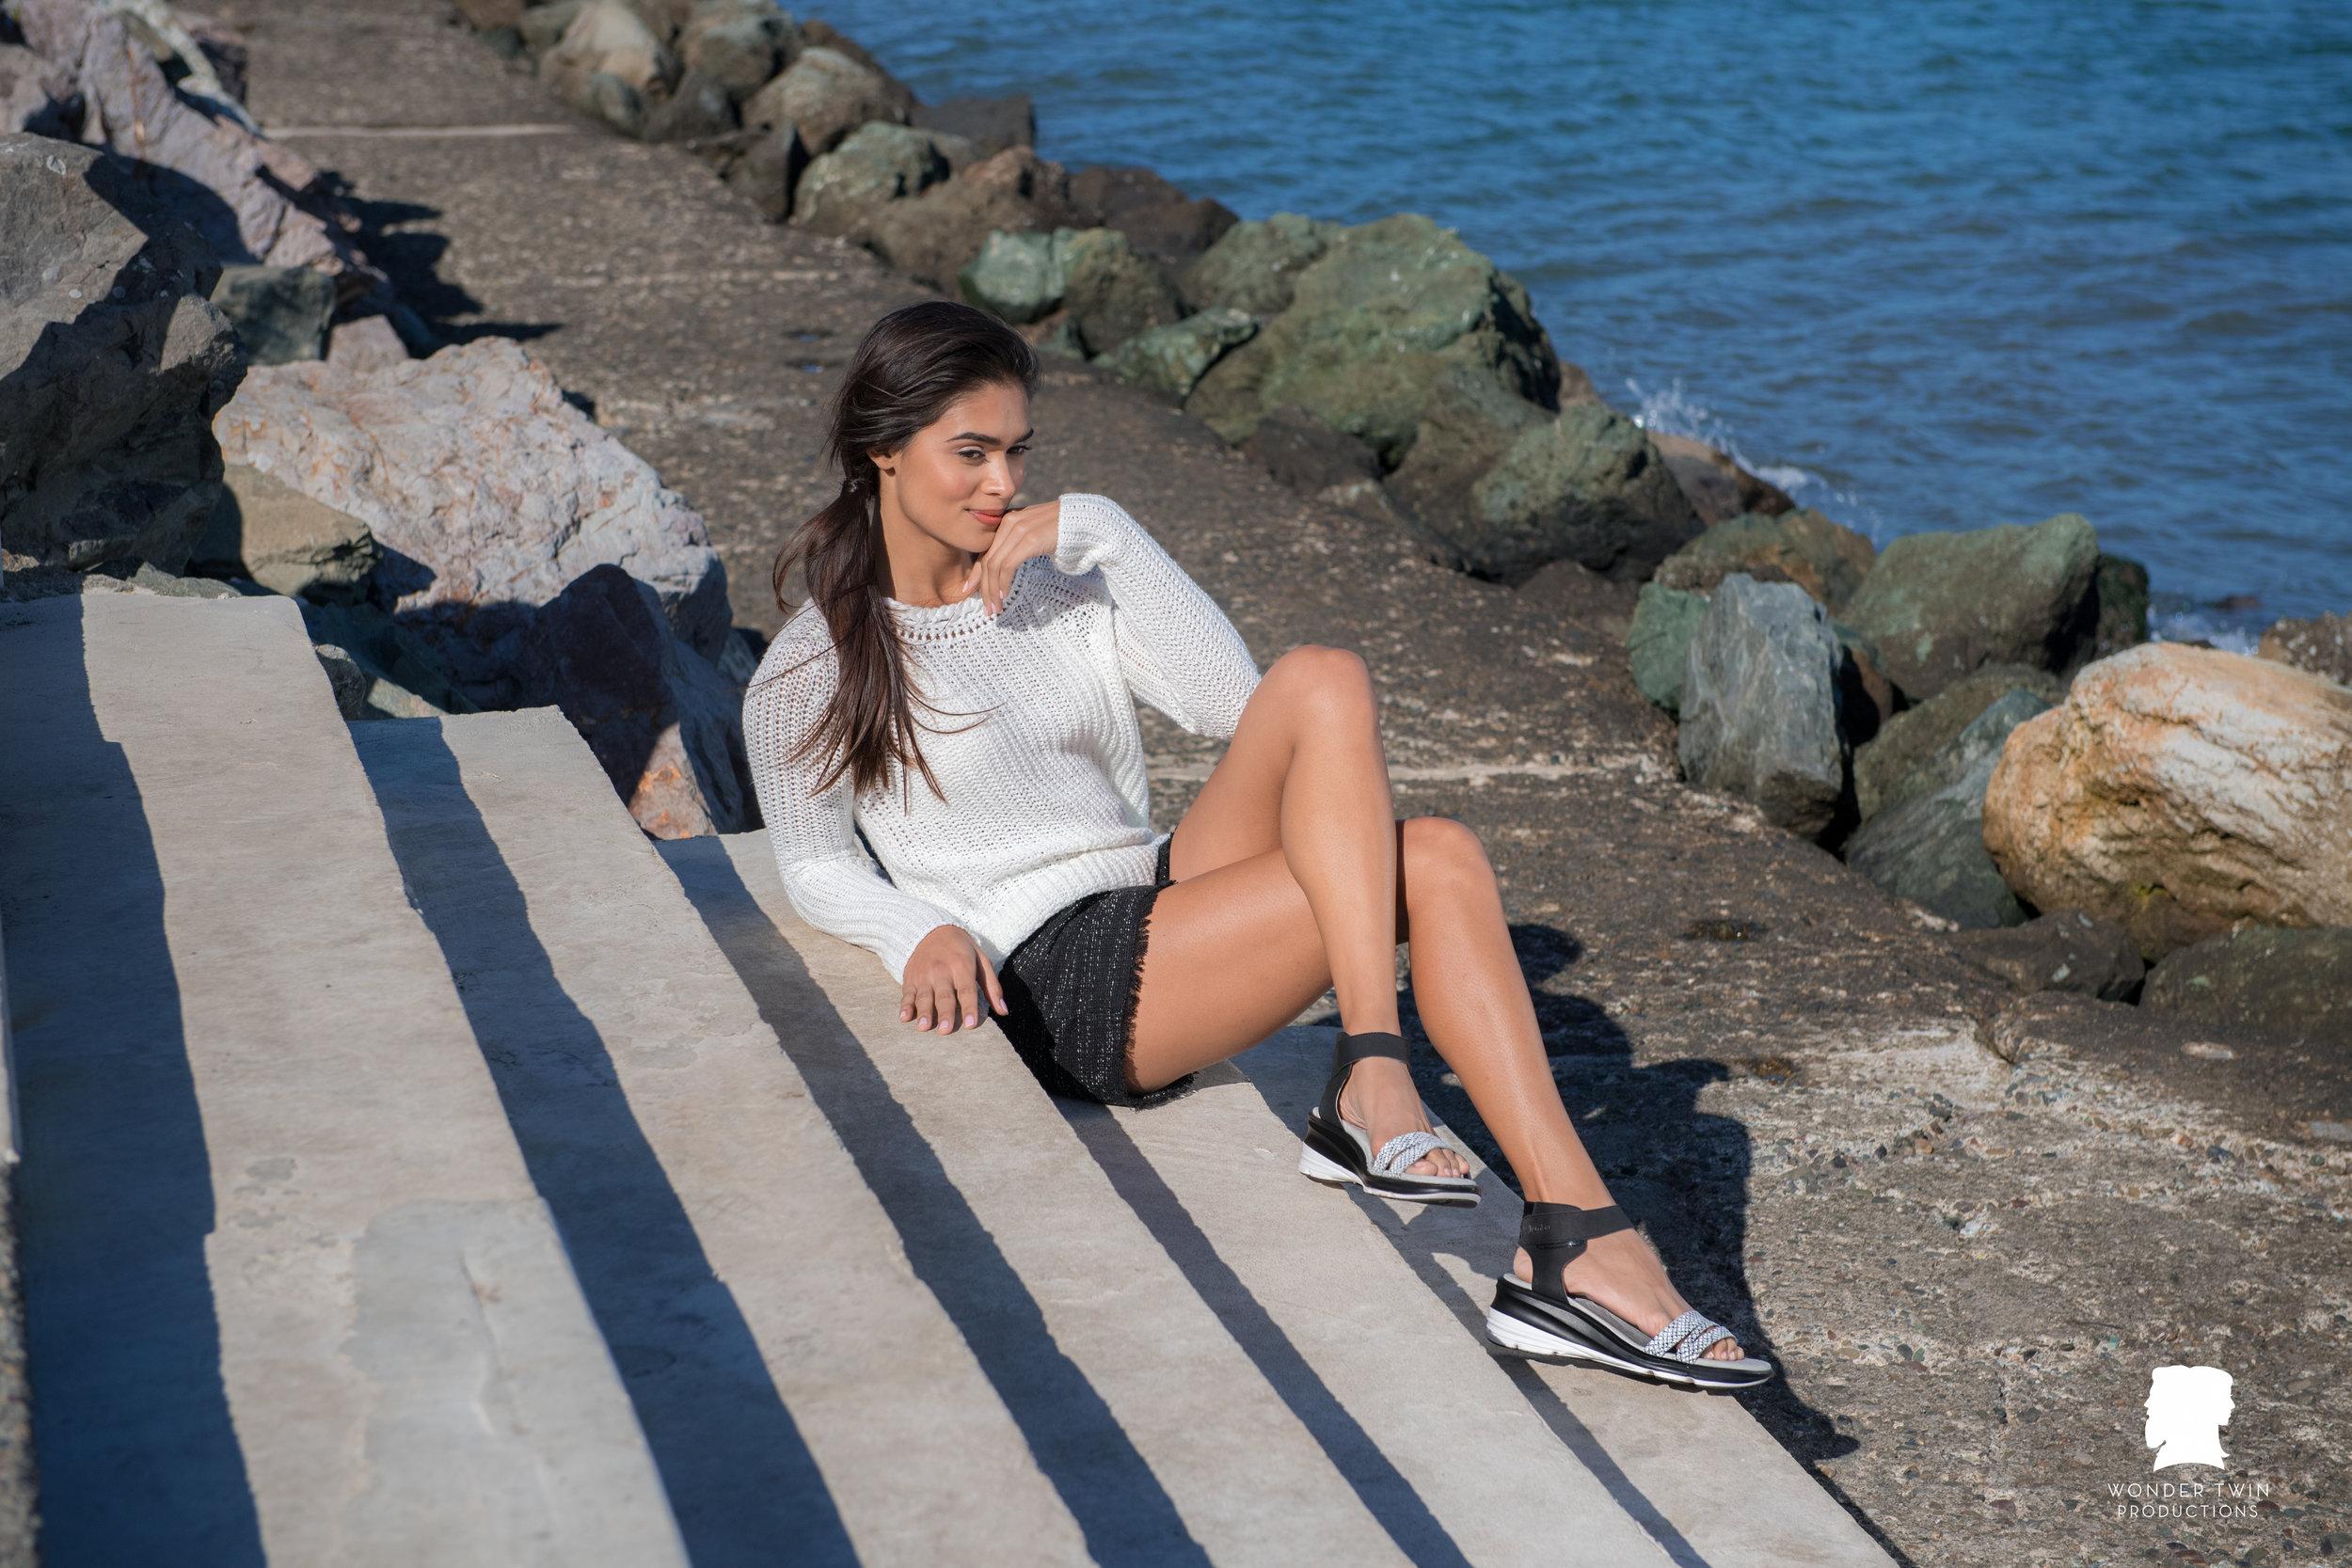 Santorini singleDSC_8196.jpg